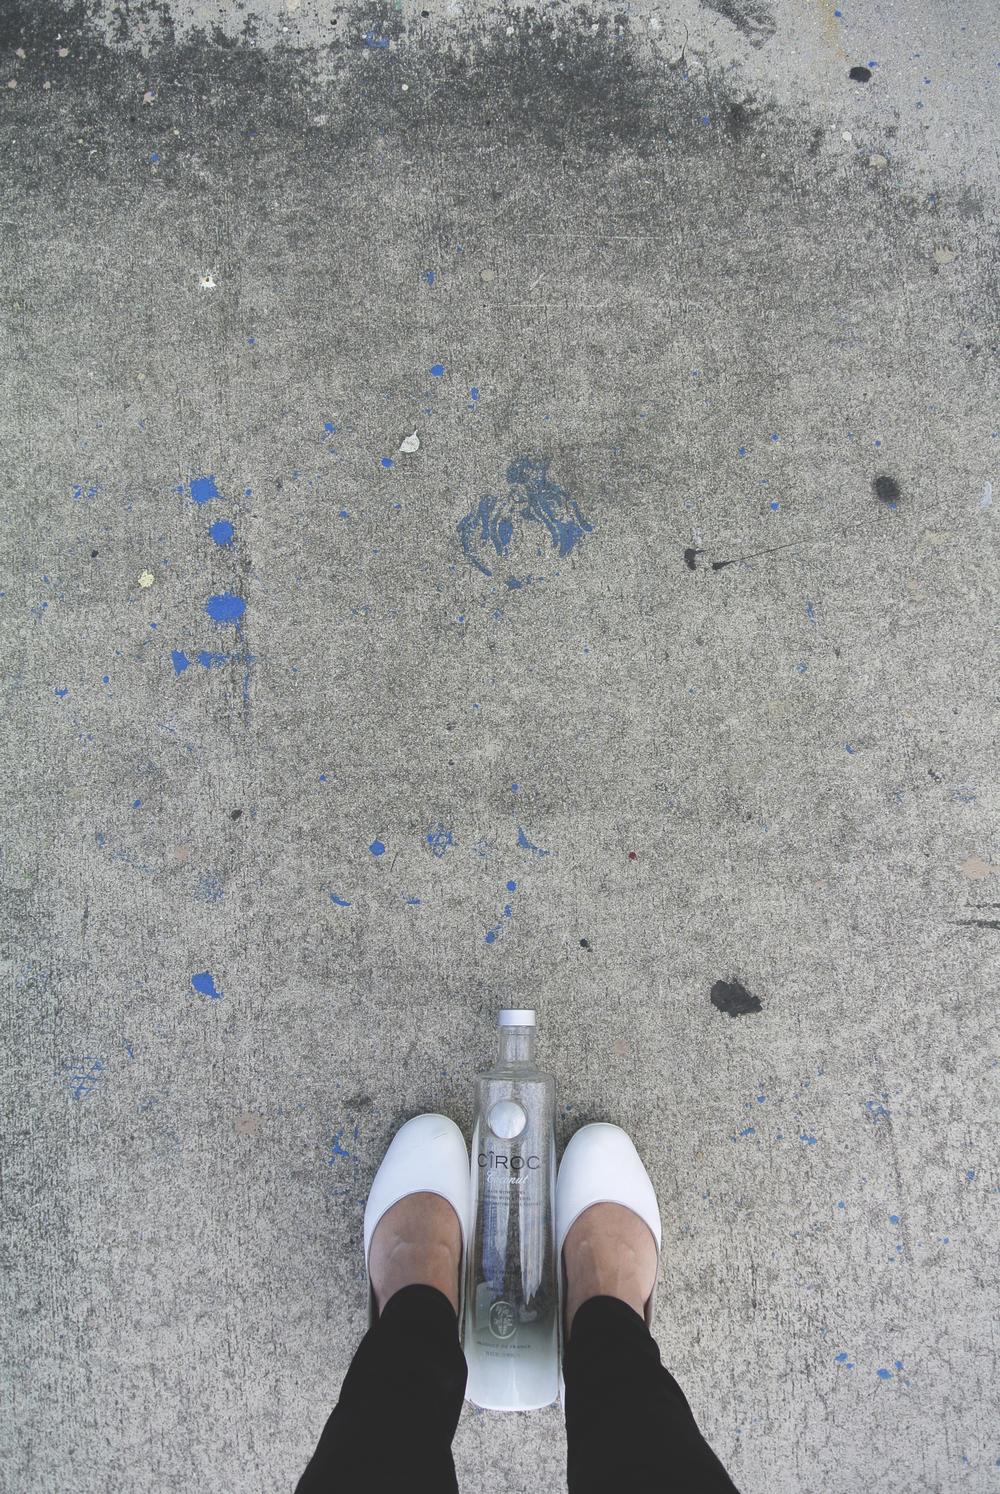 whynwoodsidewalk3.jpg